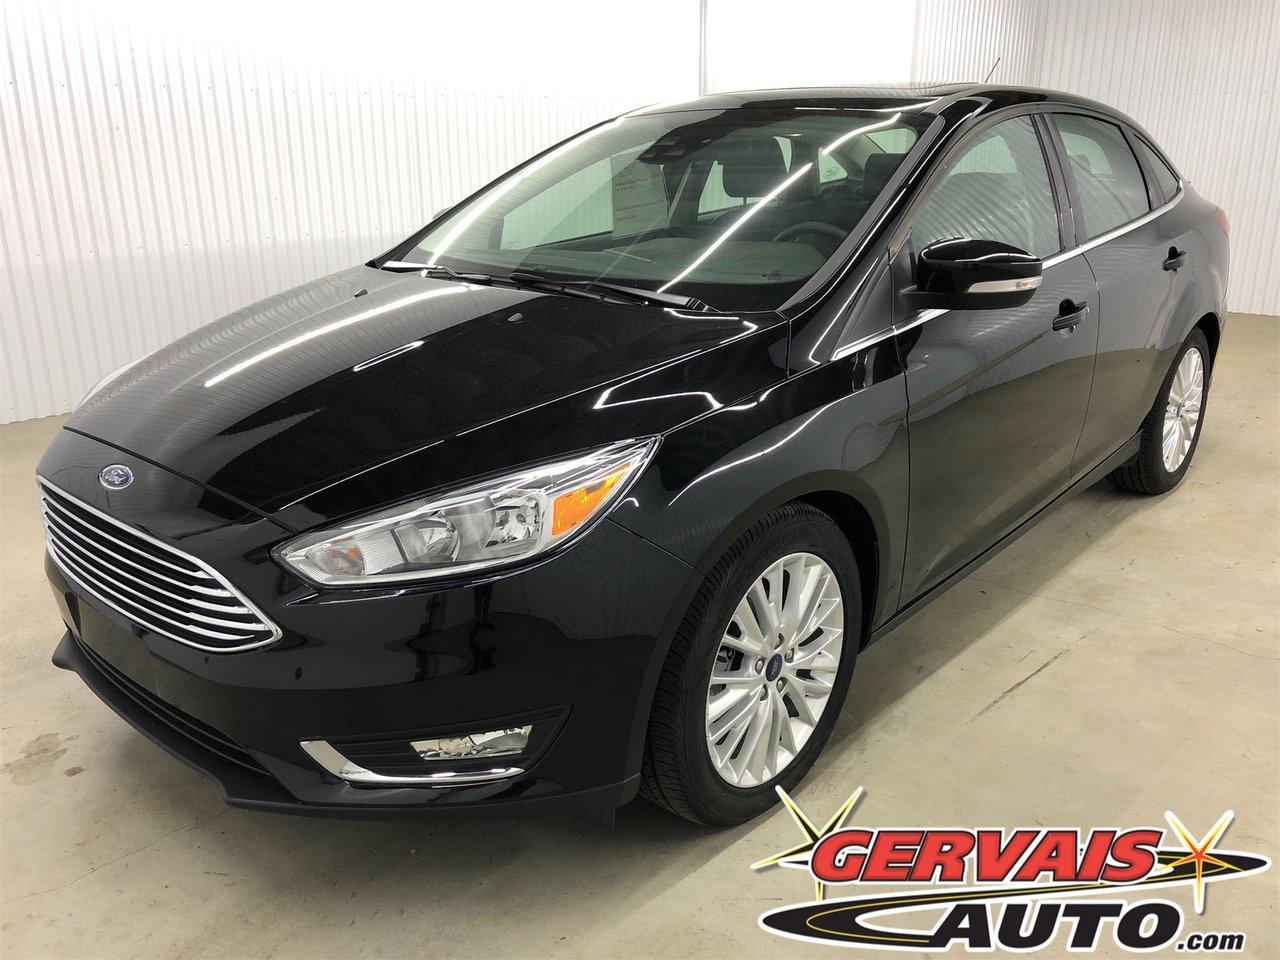 Ford Focus 2018 Titanium GPS Cuir Toit Ouvrant Cam?ra MAGS